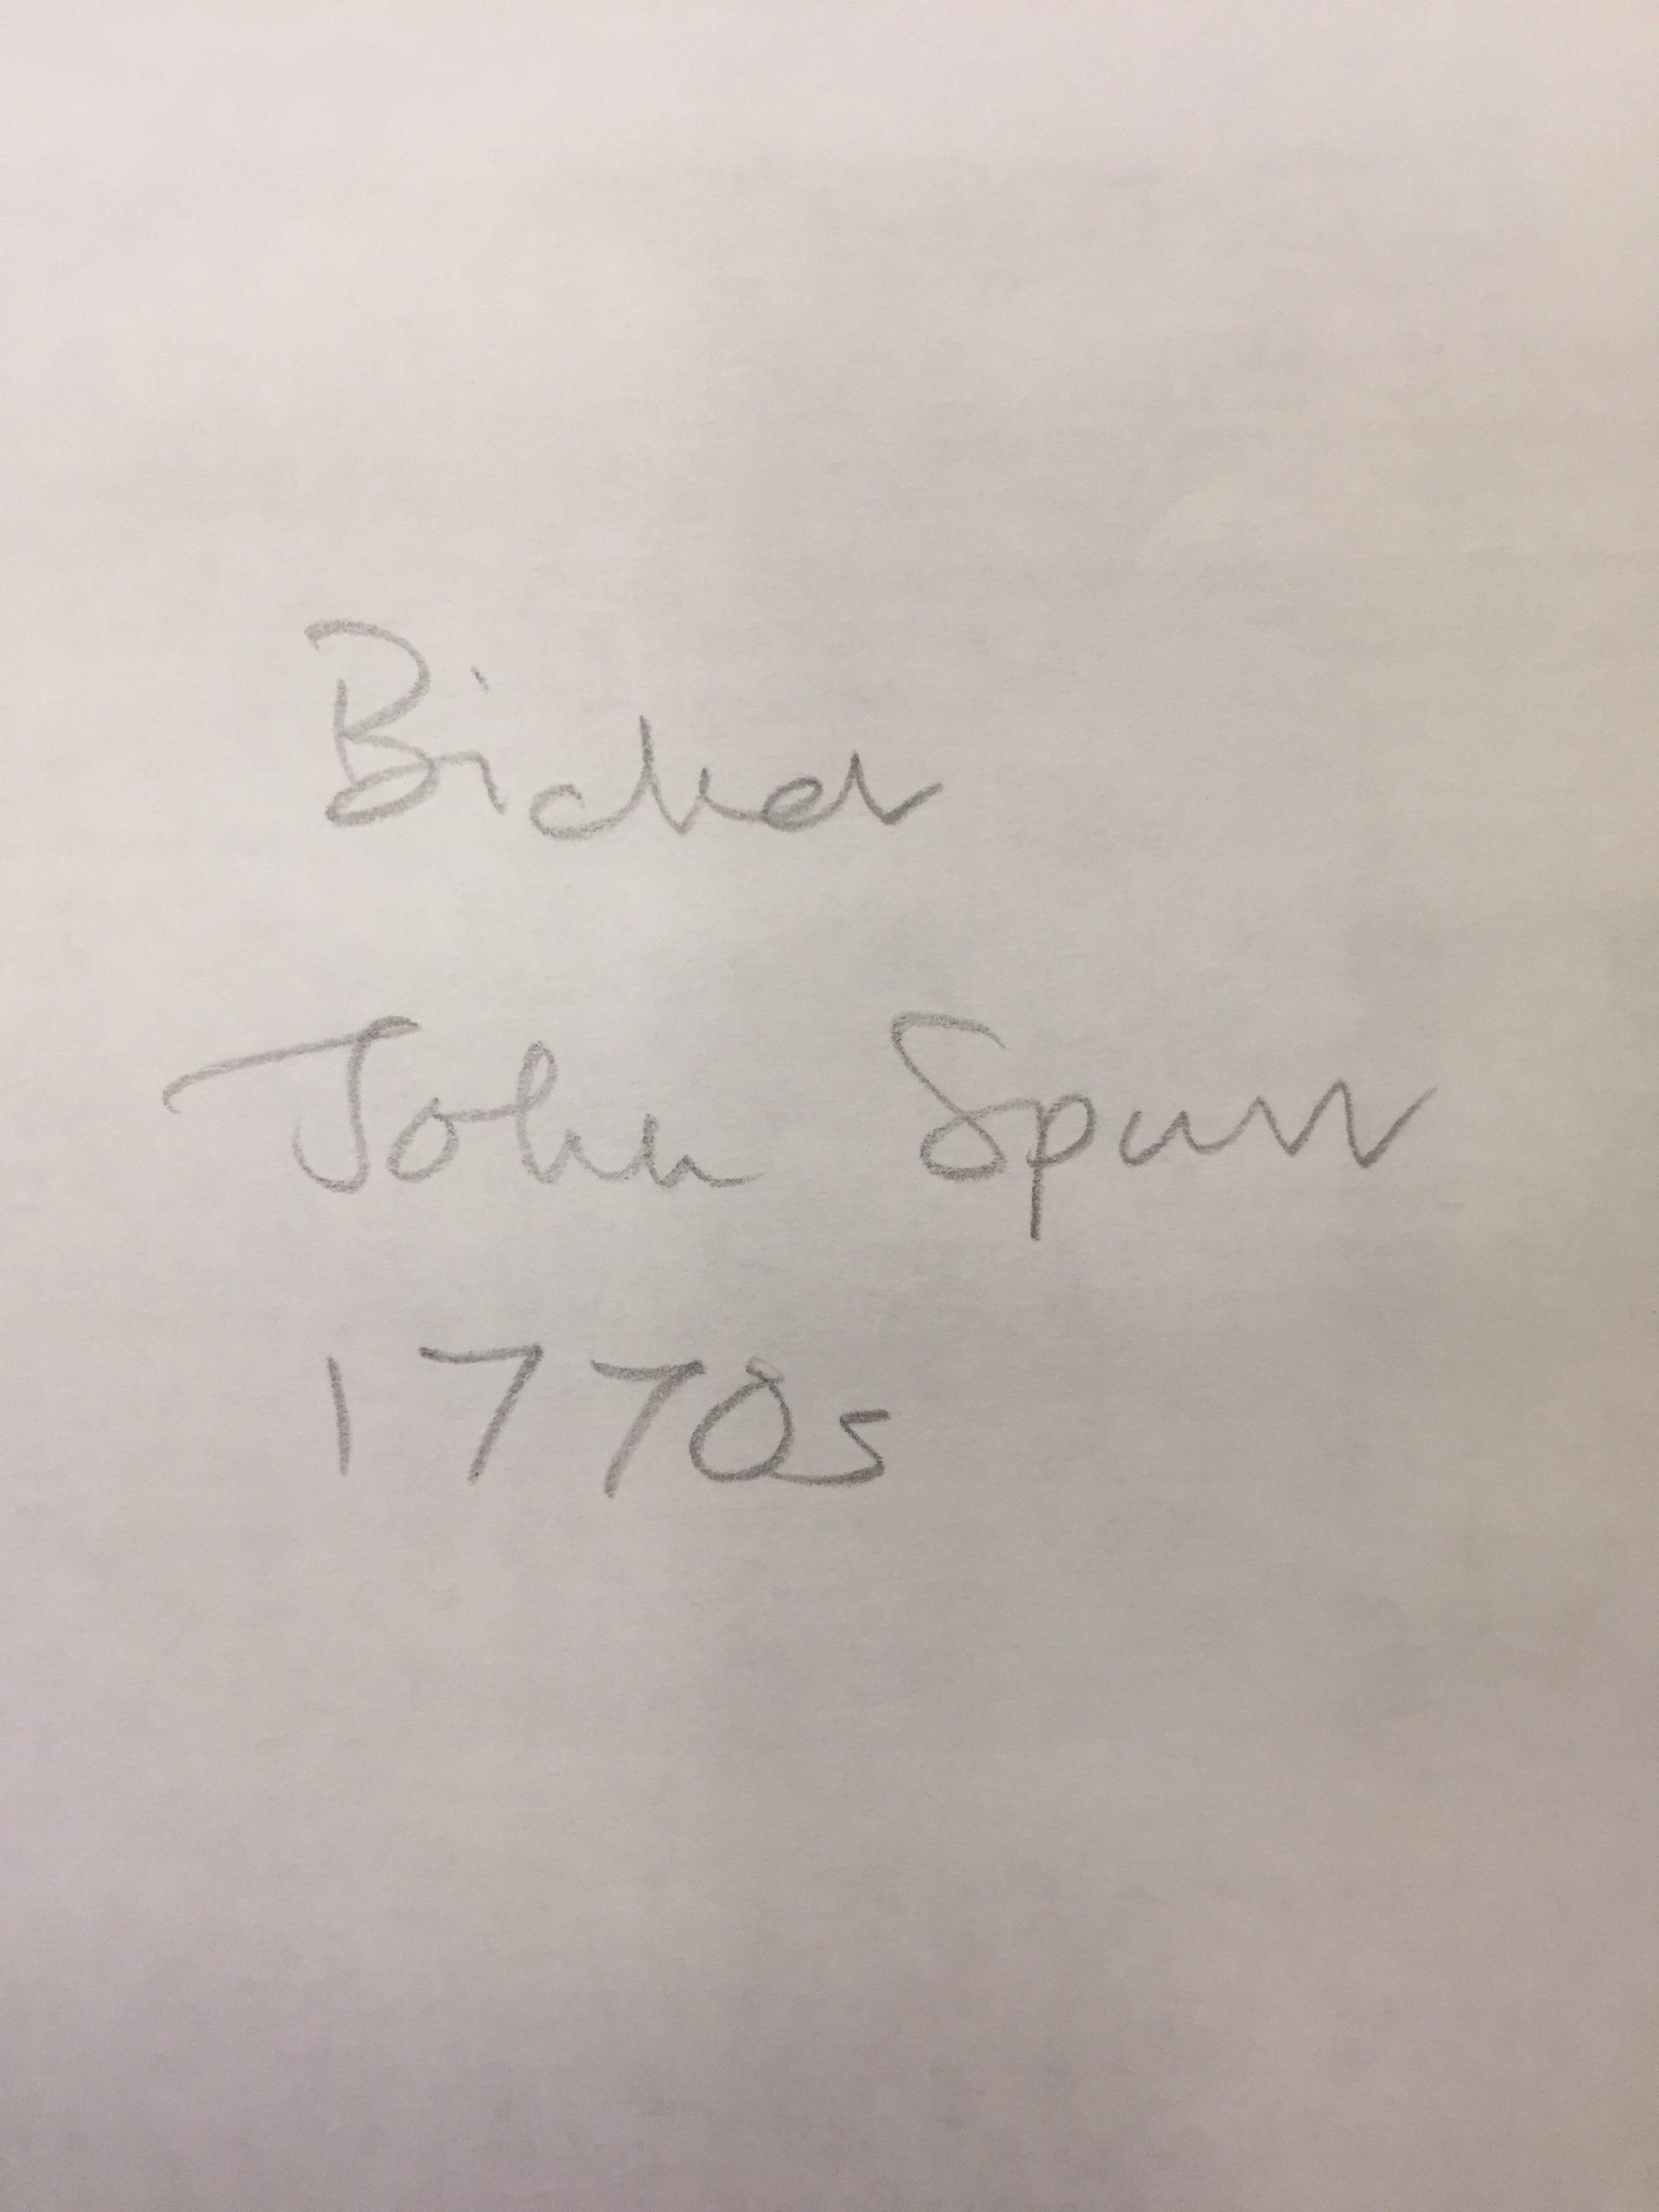 HH STSW c1770 John Spur